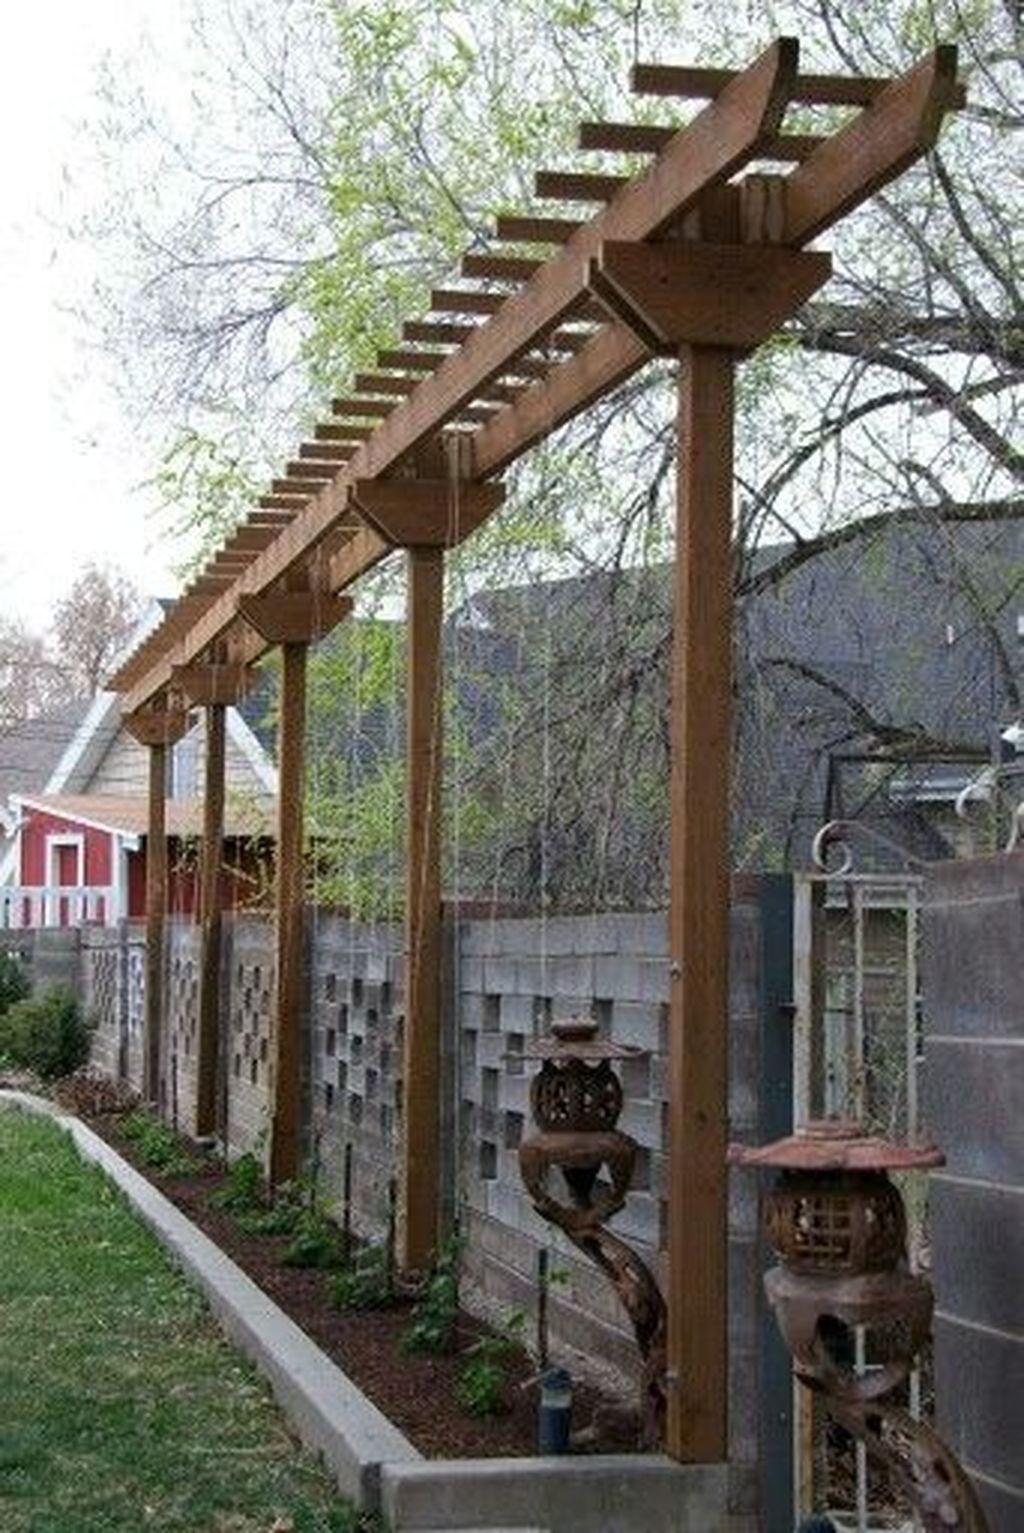 44 Awesome Pergola Trellis Ideas For Your Front Yard ... intérieur Treillis Metal Jardin